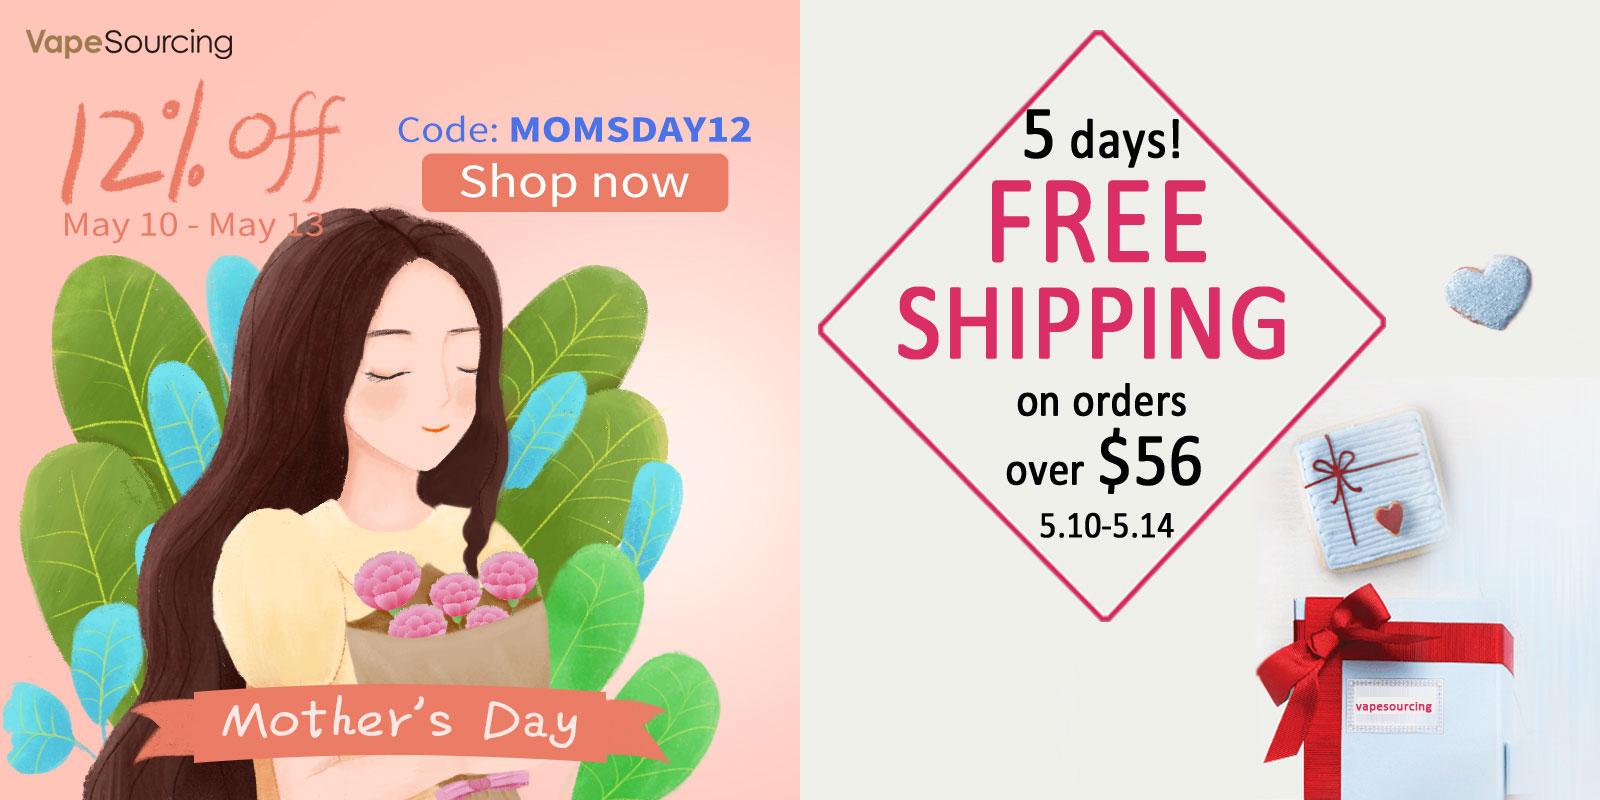 VapeSourcingの母の日セール|クーポンコードと送料無料の2本立て